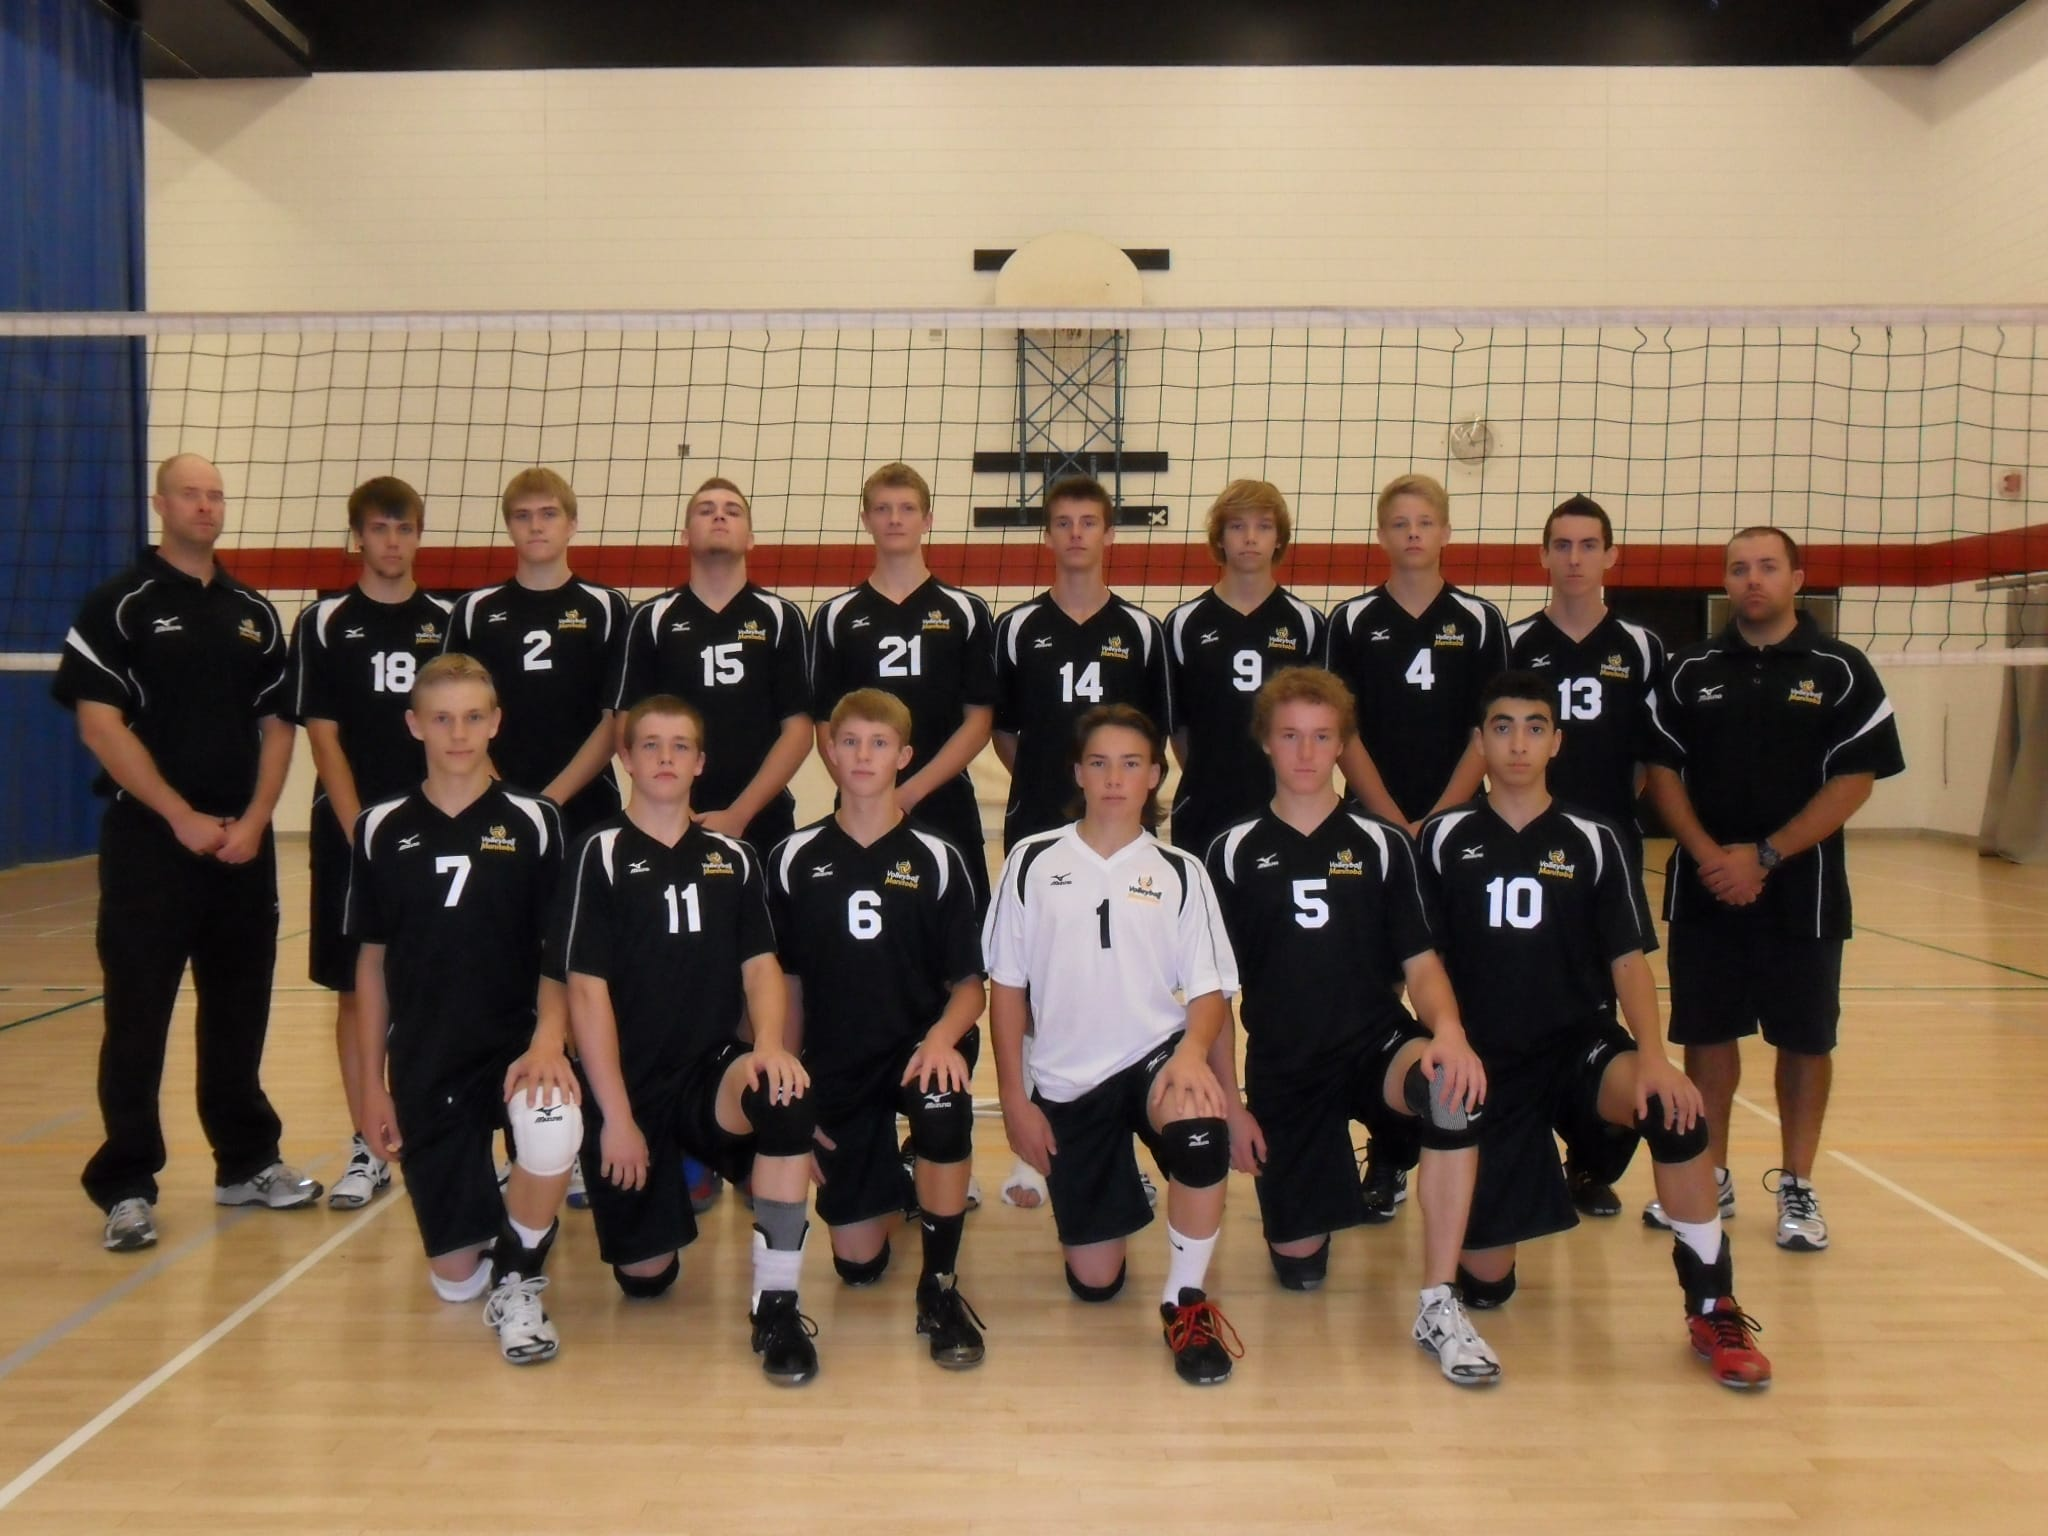 2012 Volleyball Manitoba Provincial Team Photos